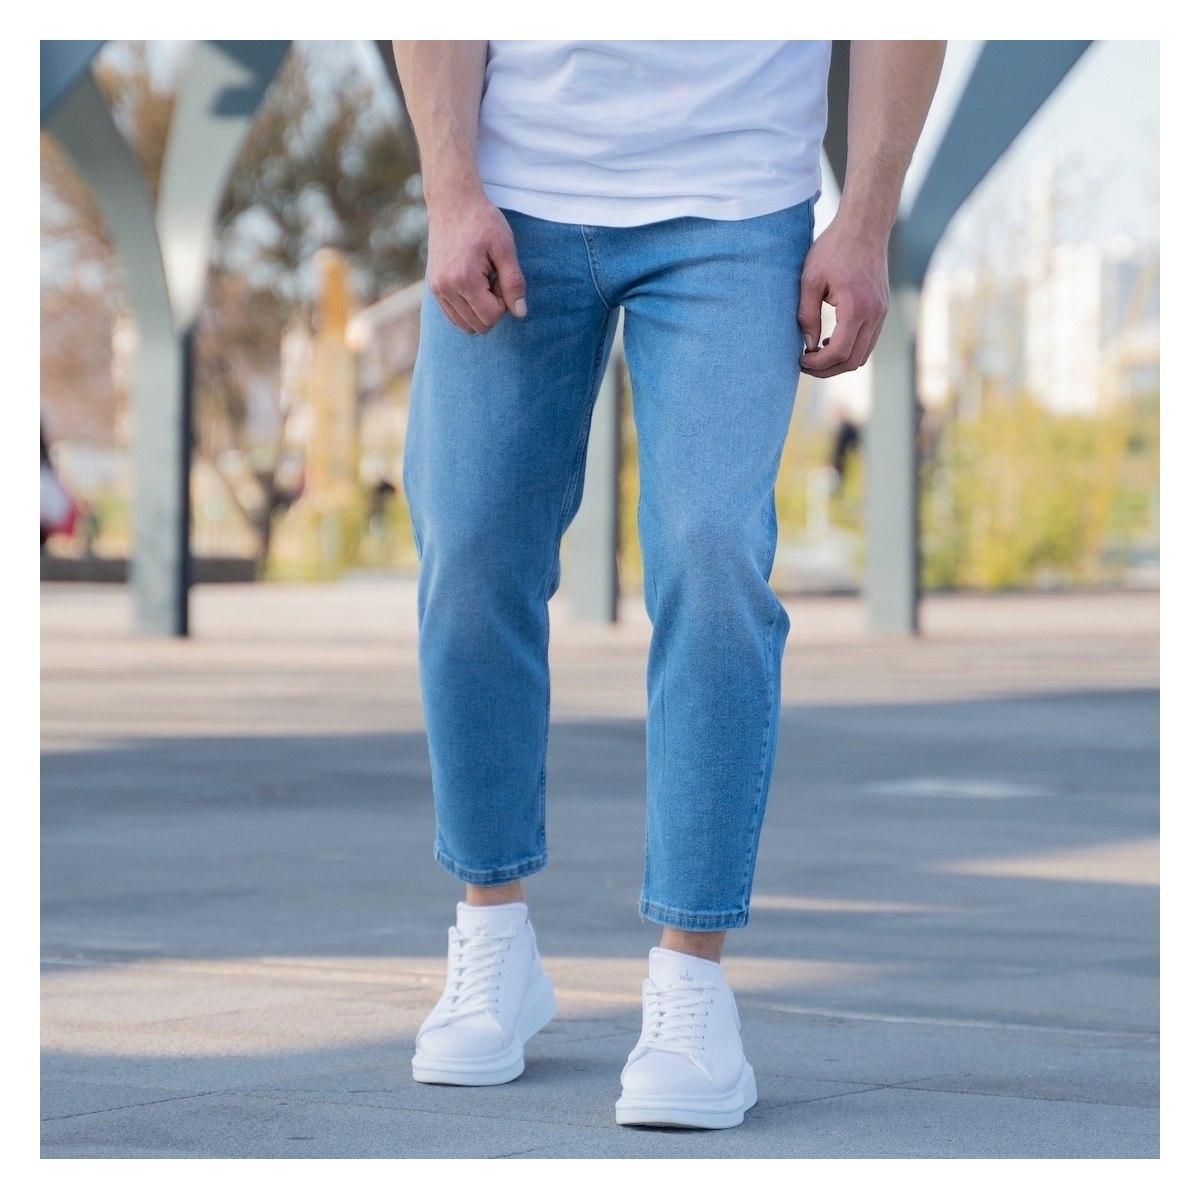 Men's Oversize Jeans In Blue